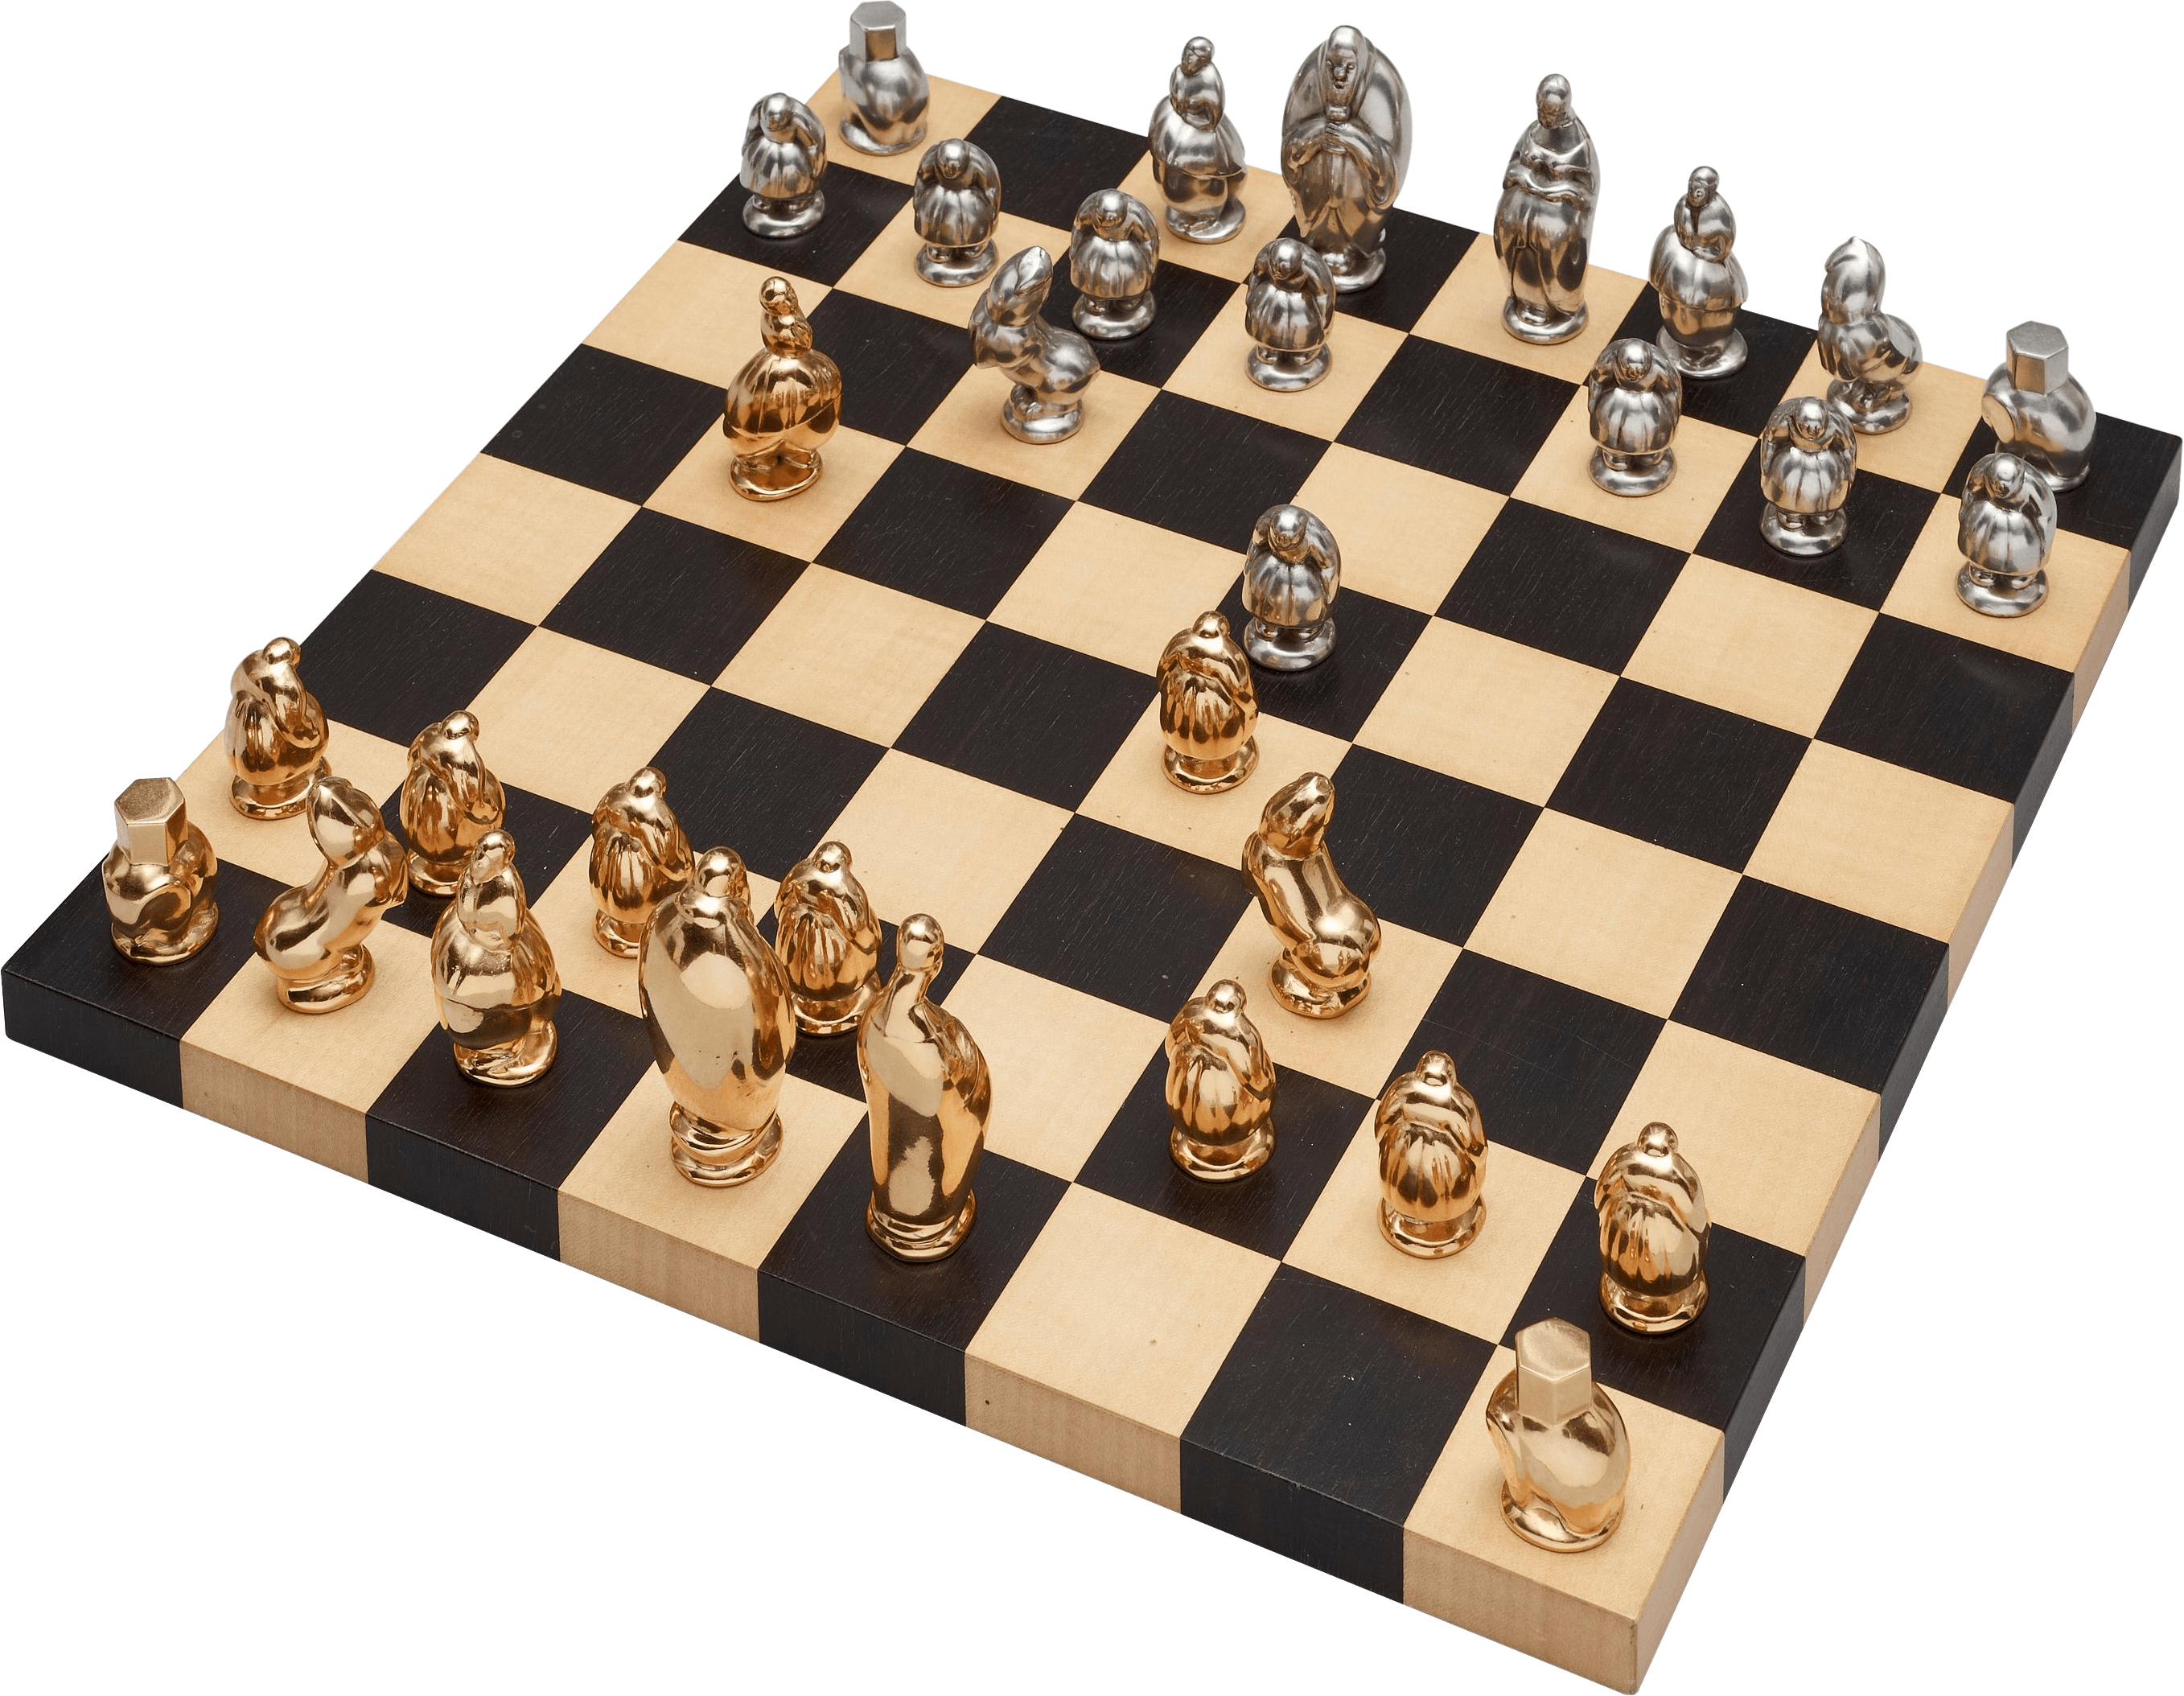 Download Free Chess Board Png Image ICON favicon | FreePNGImg